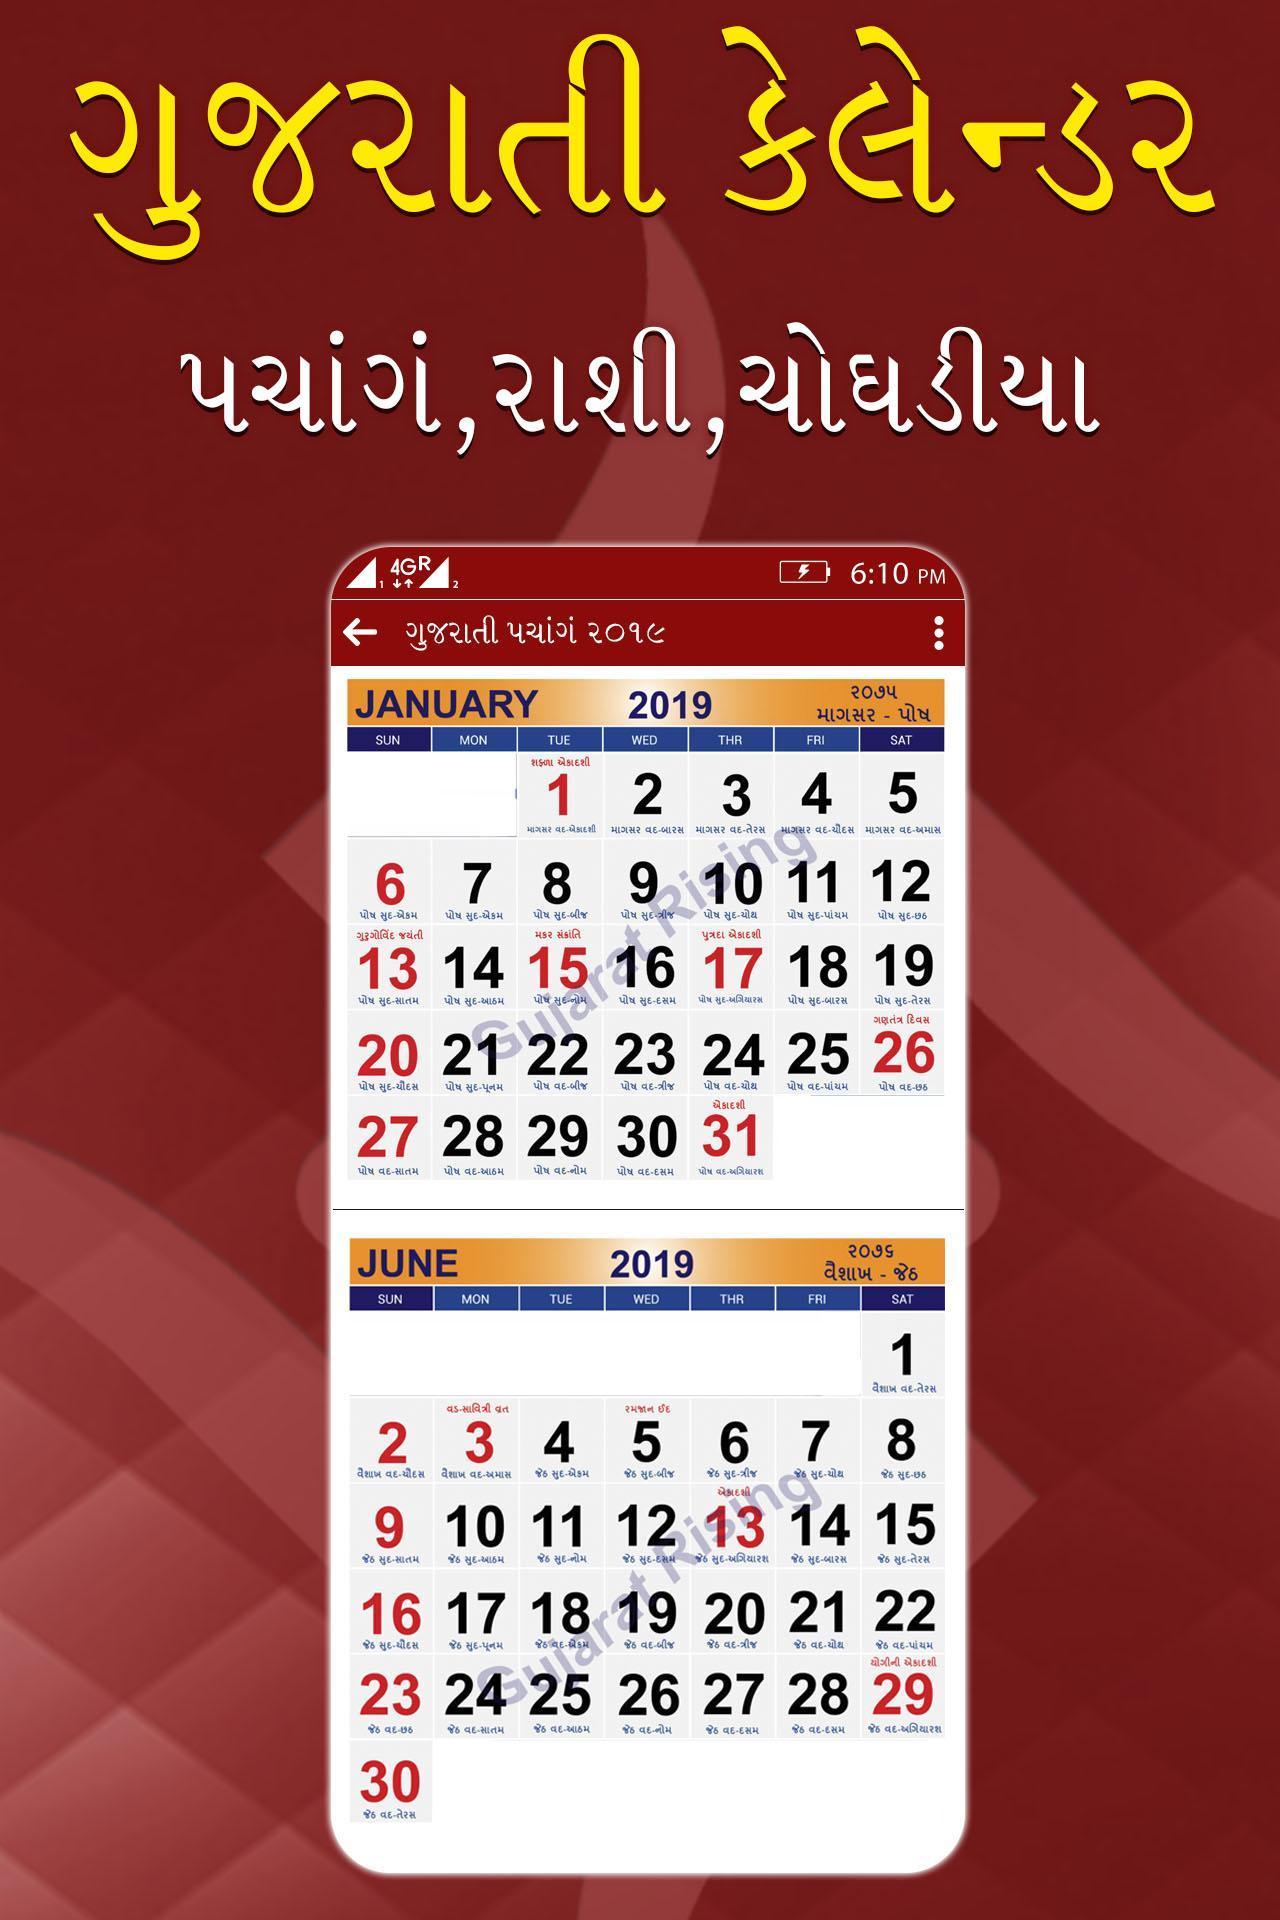 Gujarati Calendar 2022.Gujarati Calendar 2019 Panchang 2018 19 For Android Apk Download